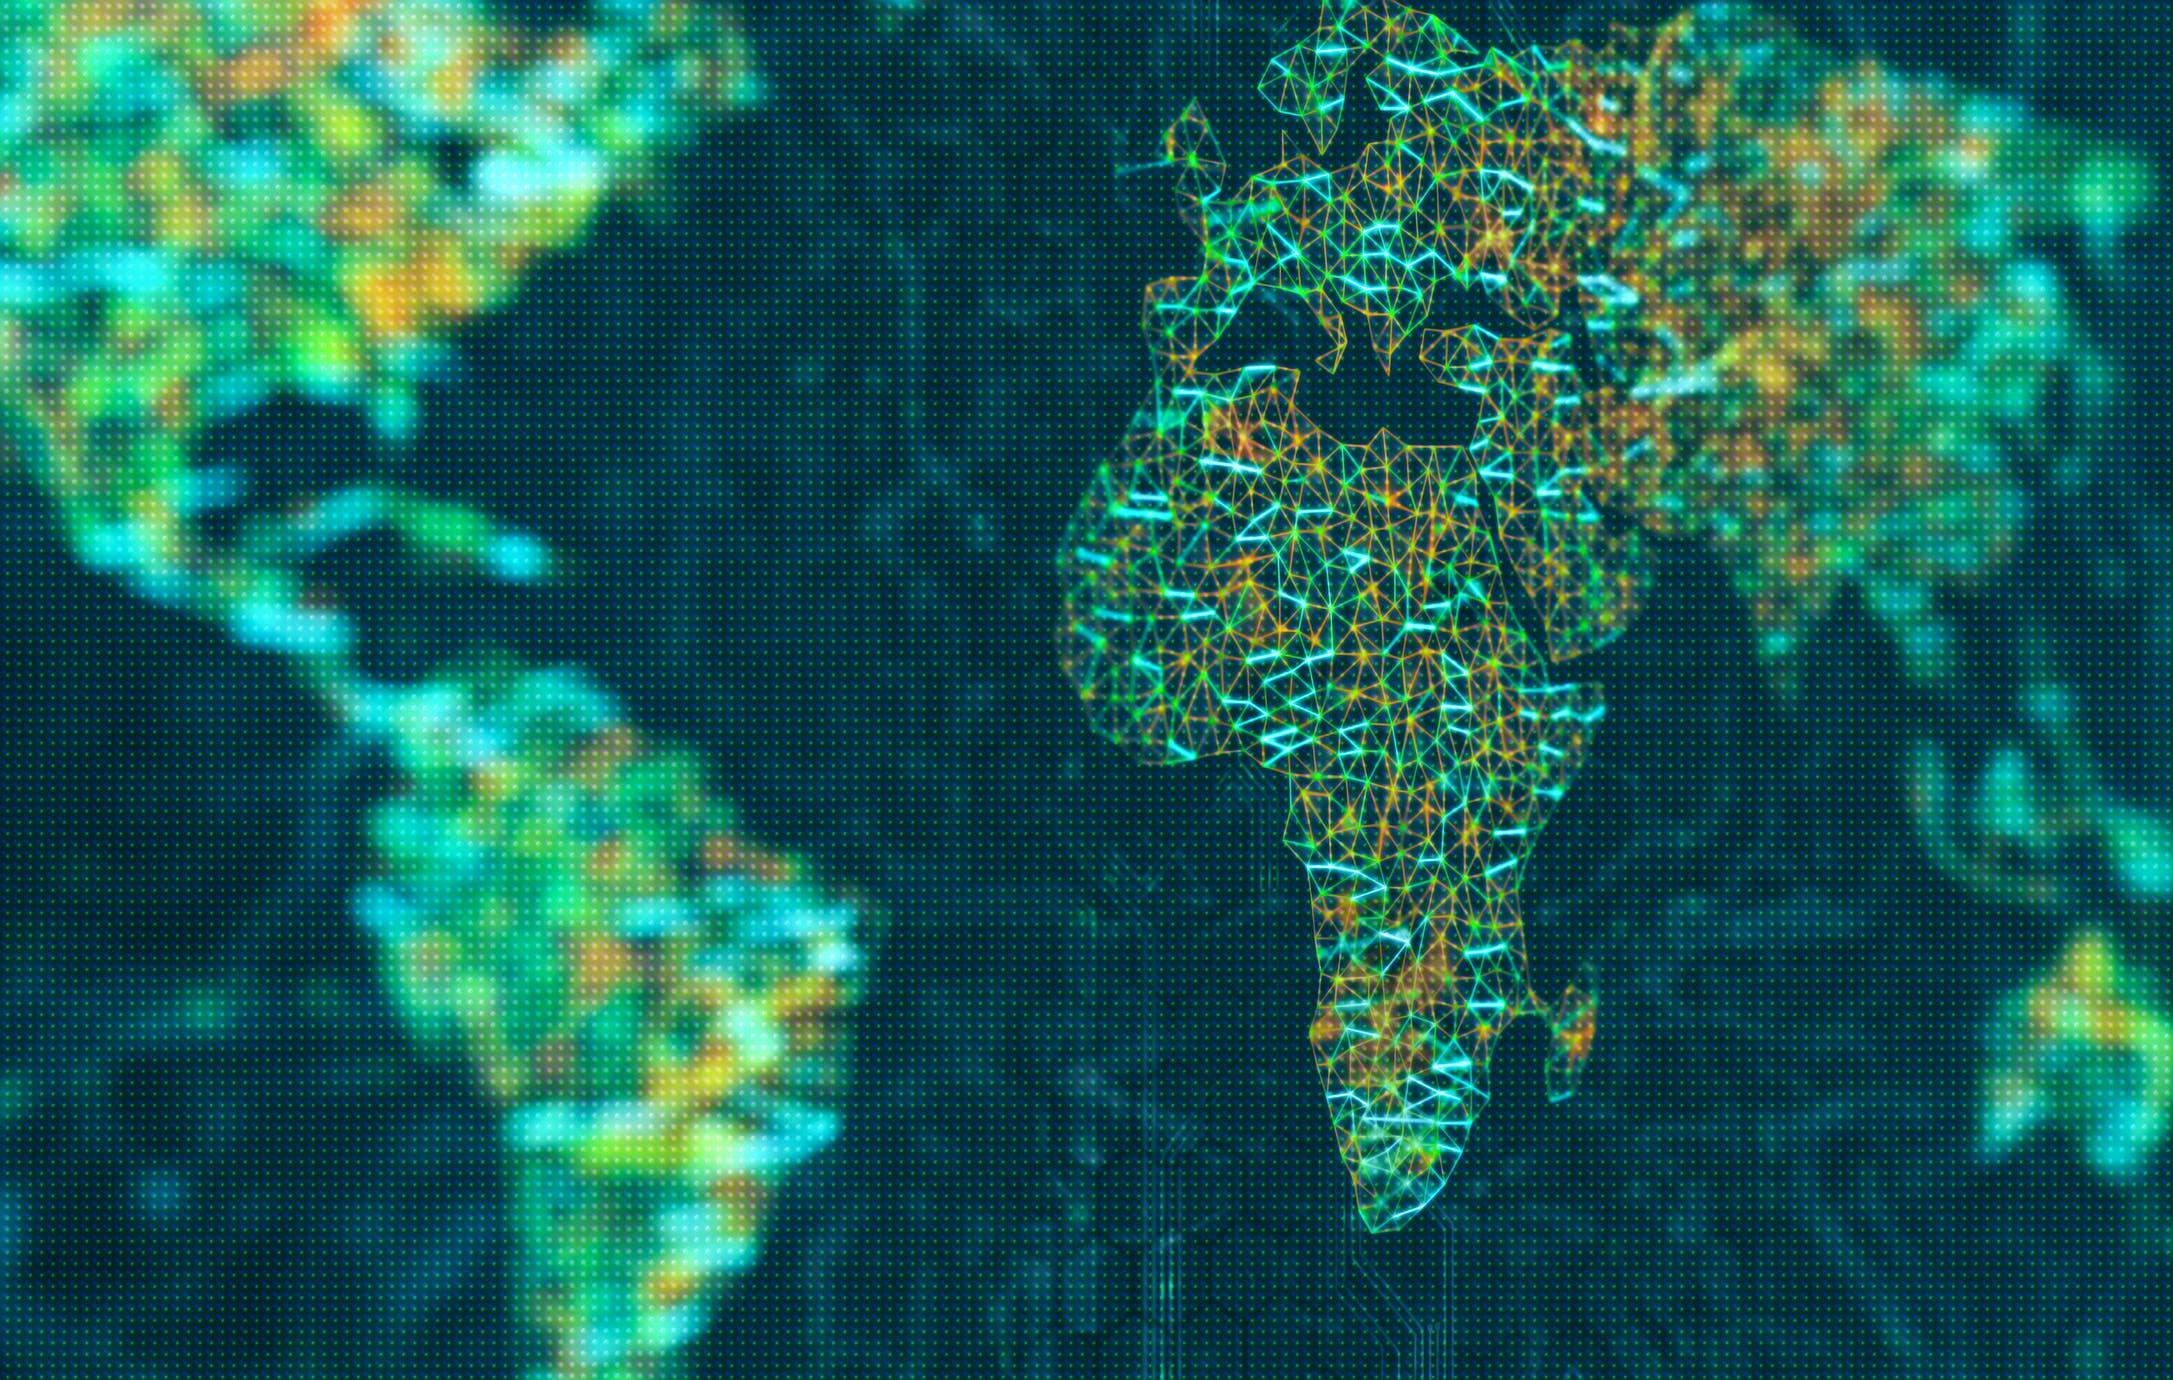 Africa technology